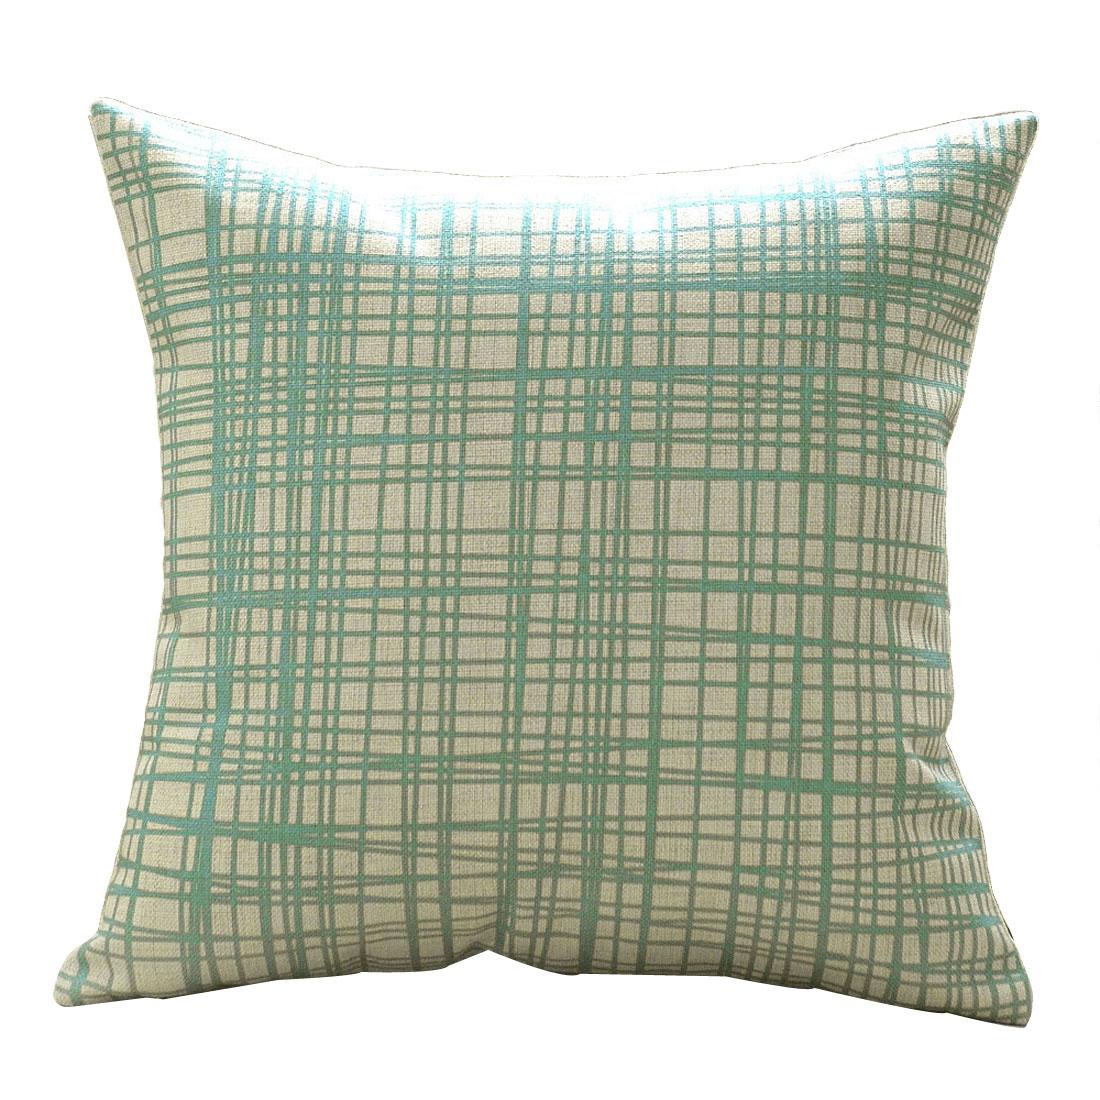 Home Cotton Linen Geometric Pattern Square Design Retro Style Cushion Pillow Cover